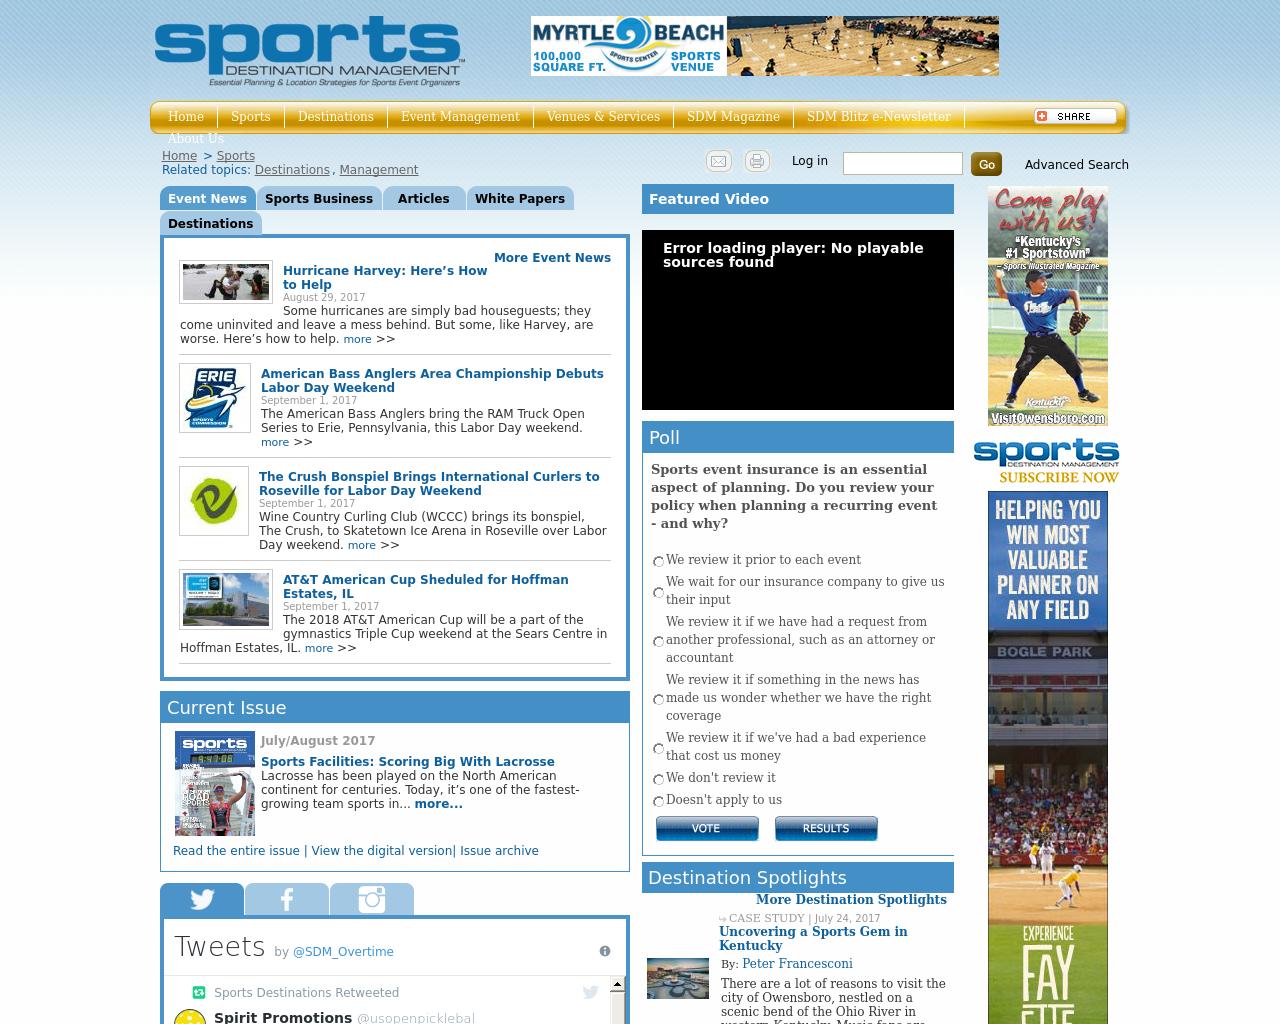 Sports-Destination-Management-Advertising-Reviews-Pricing